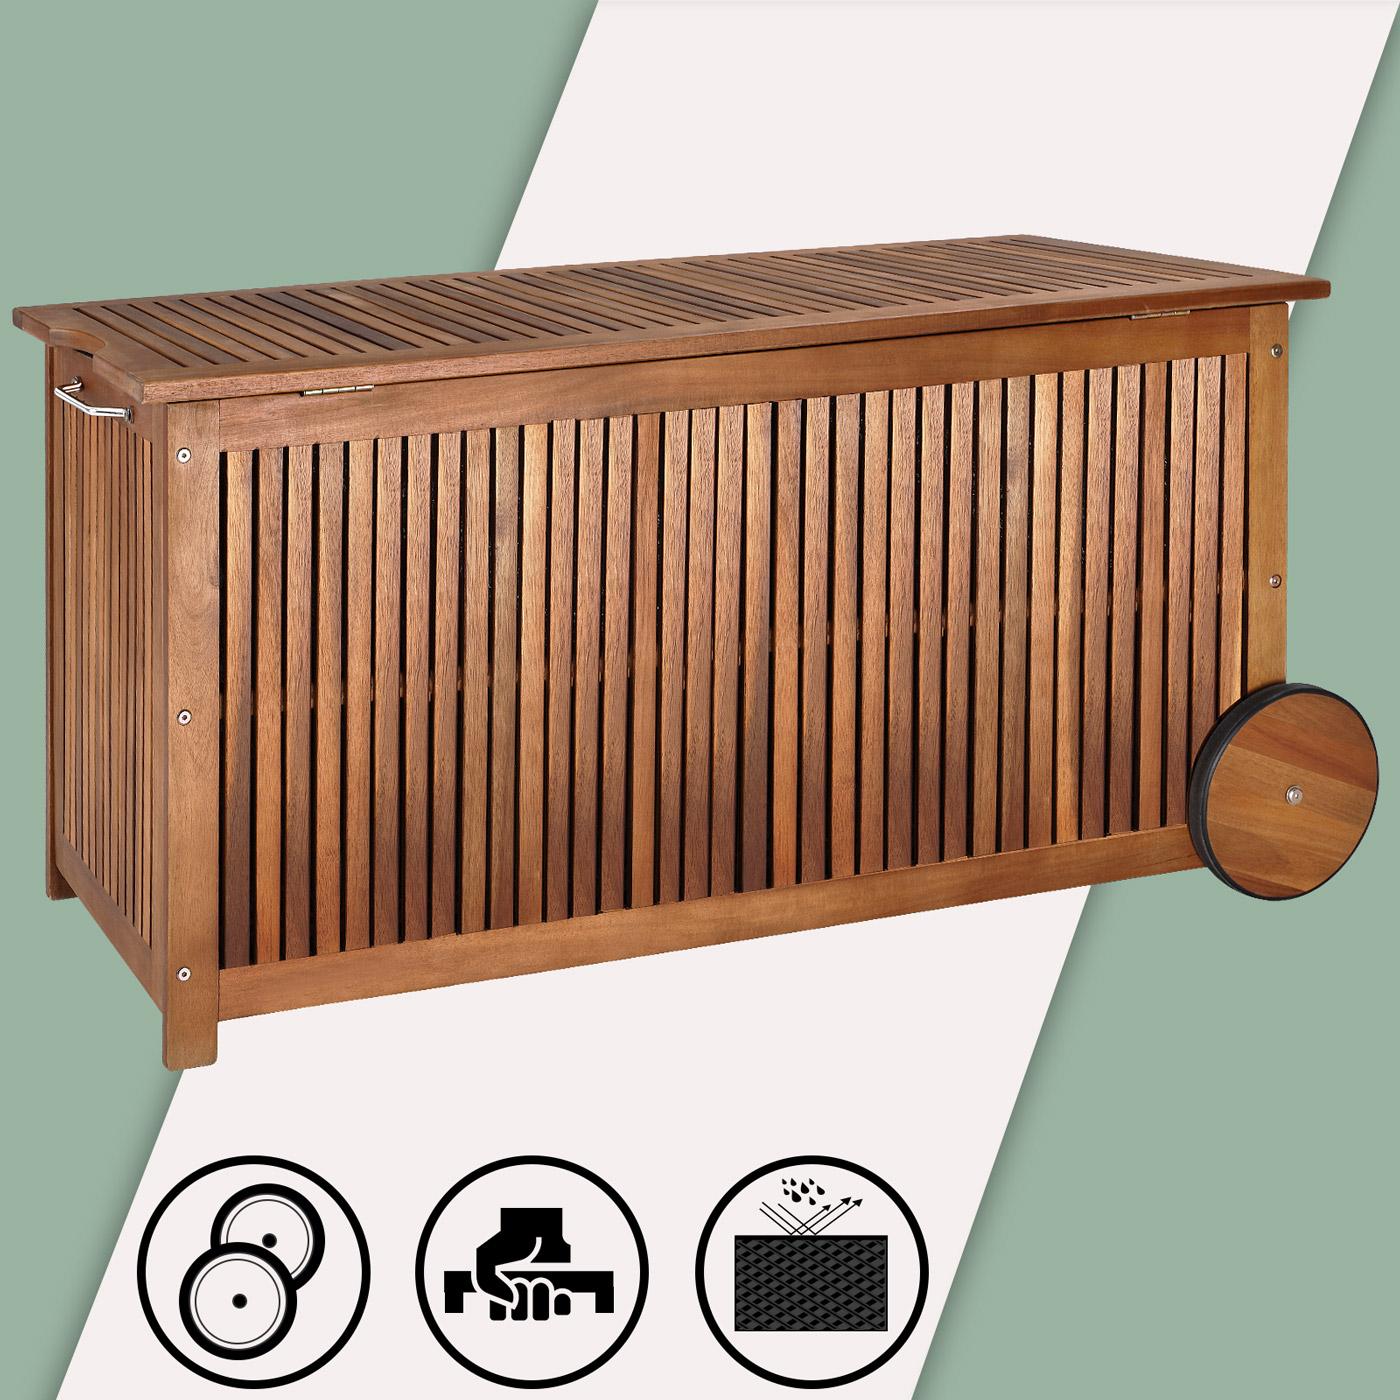 wooden cushion box wheels 117cm acacia wood outdoor patio garden storage chest ebay. Black Bedroom Furniture Sets. Home Design Ideas